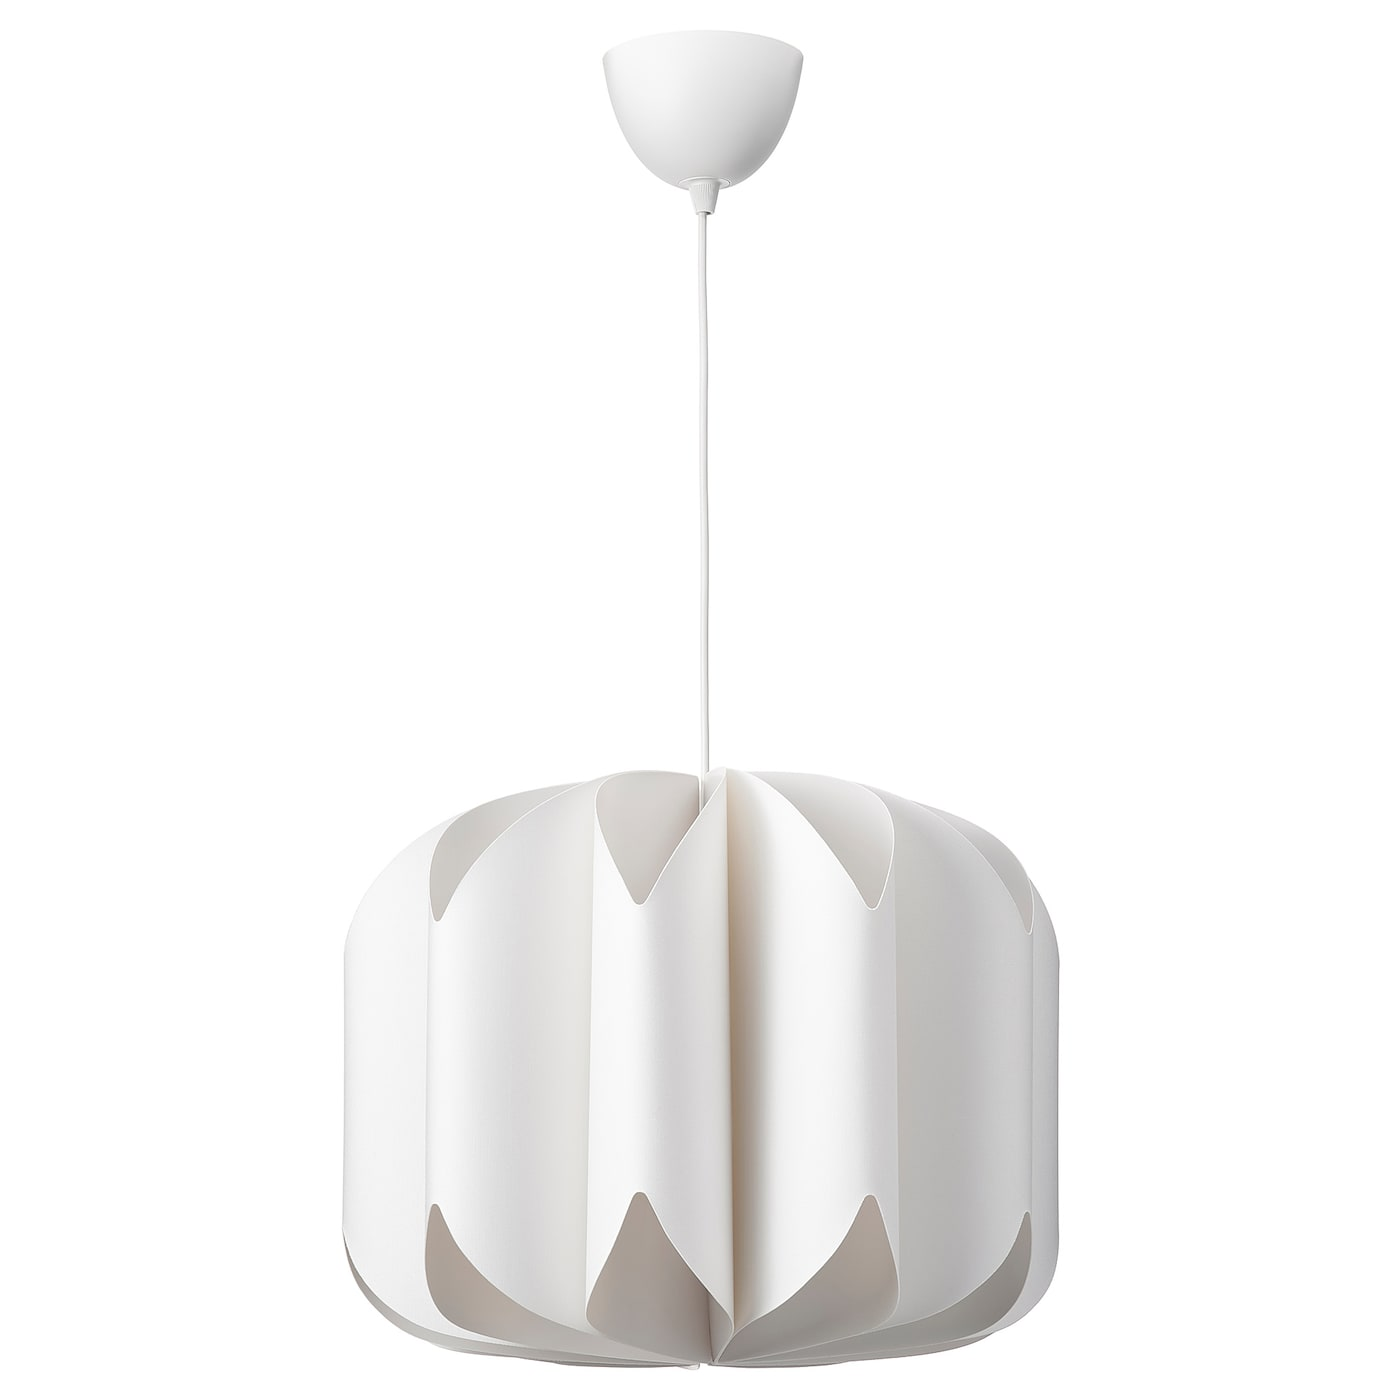 MOJNA / HEMMA Loftlampe, hvid